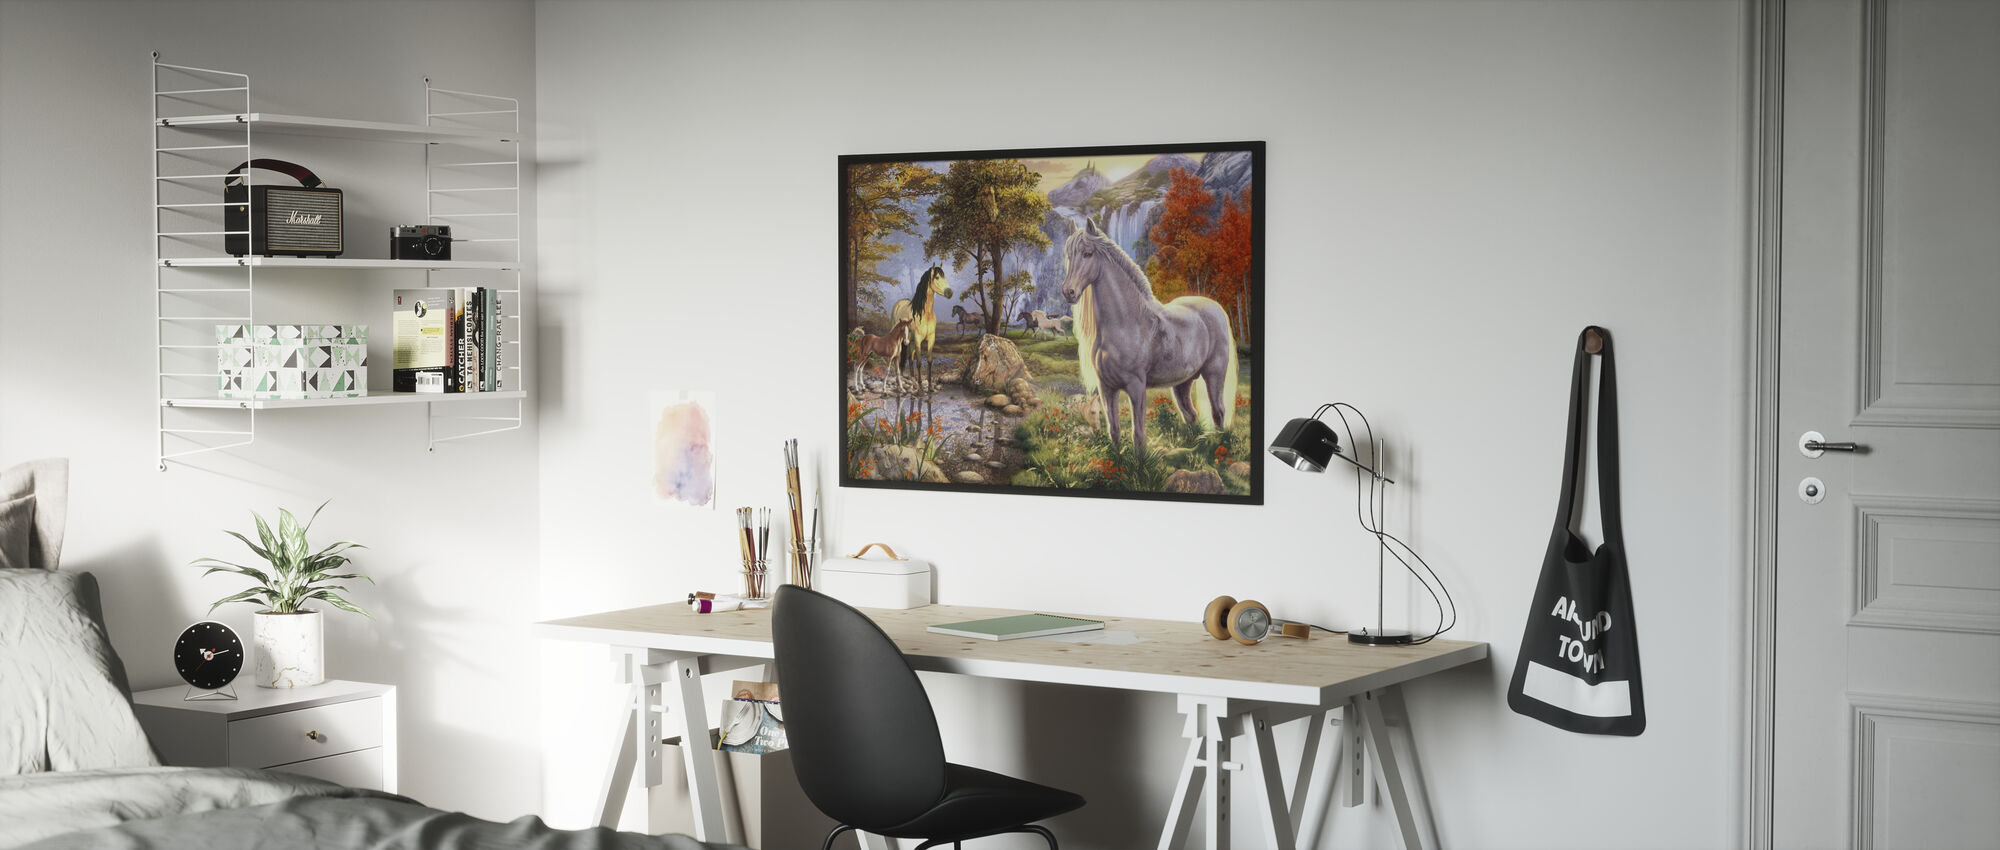 Dolda bilder - Hästar - Inramad tavla - Barnrum